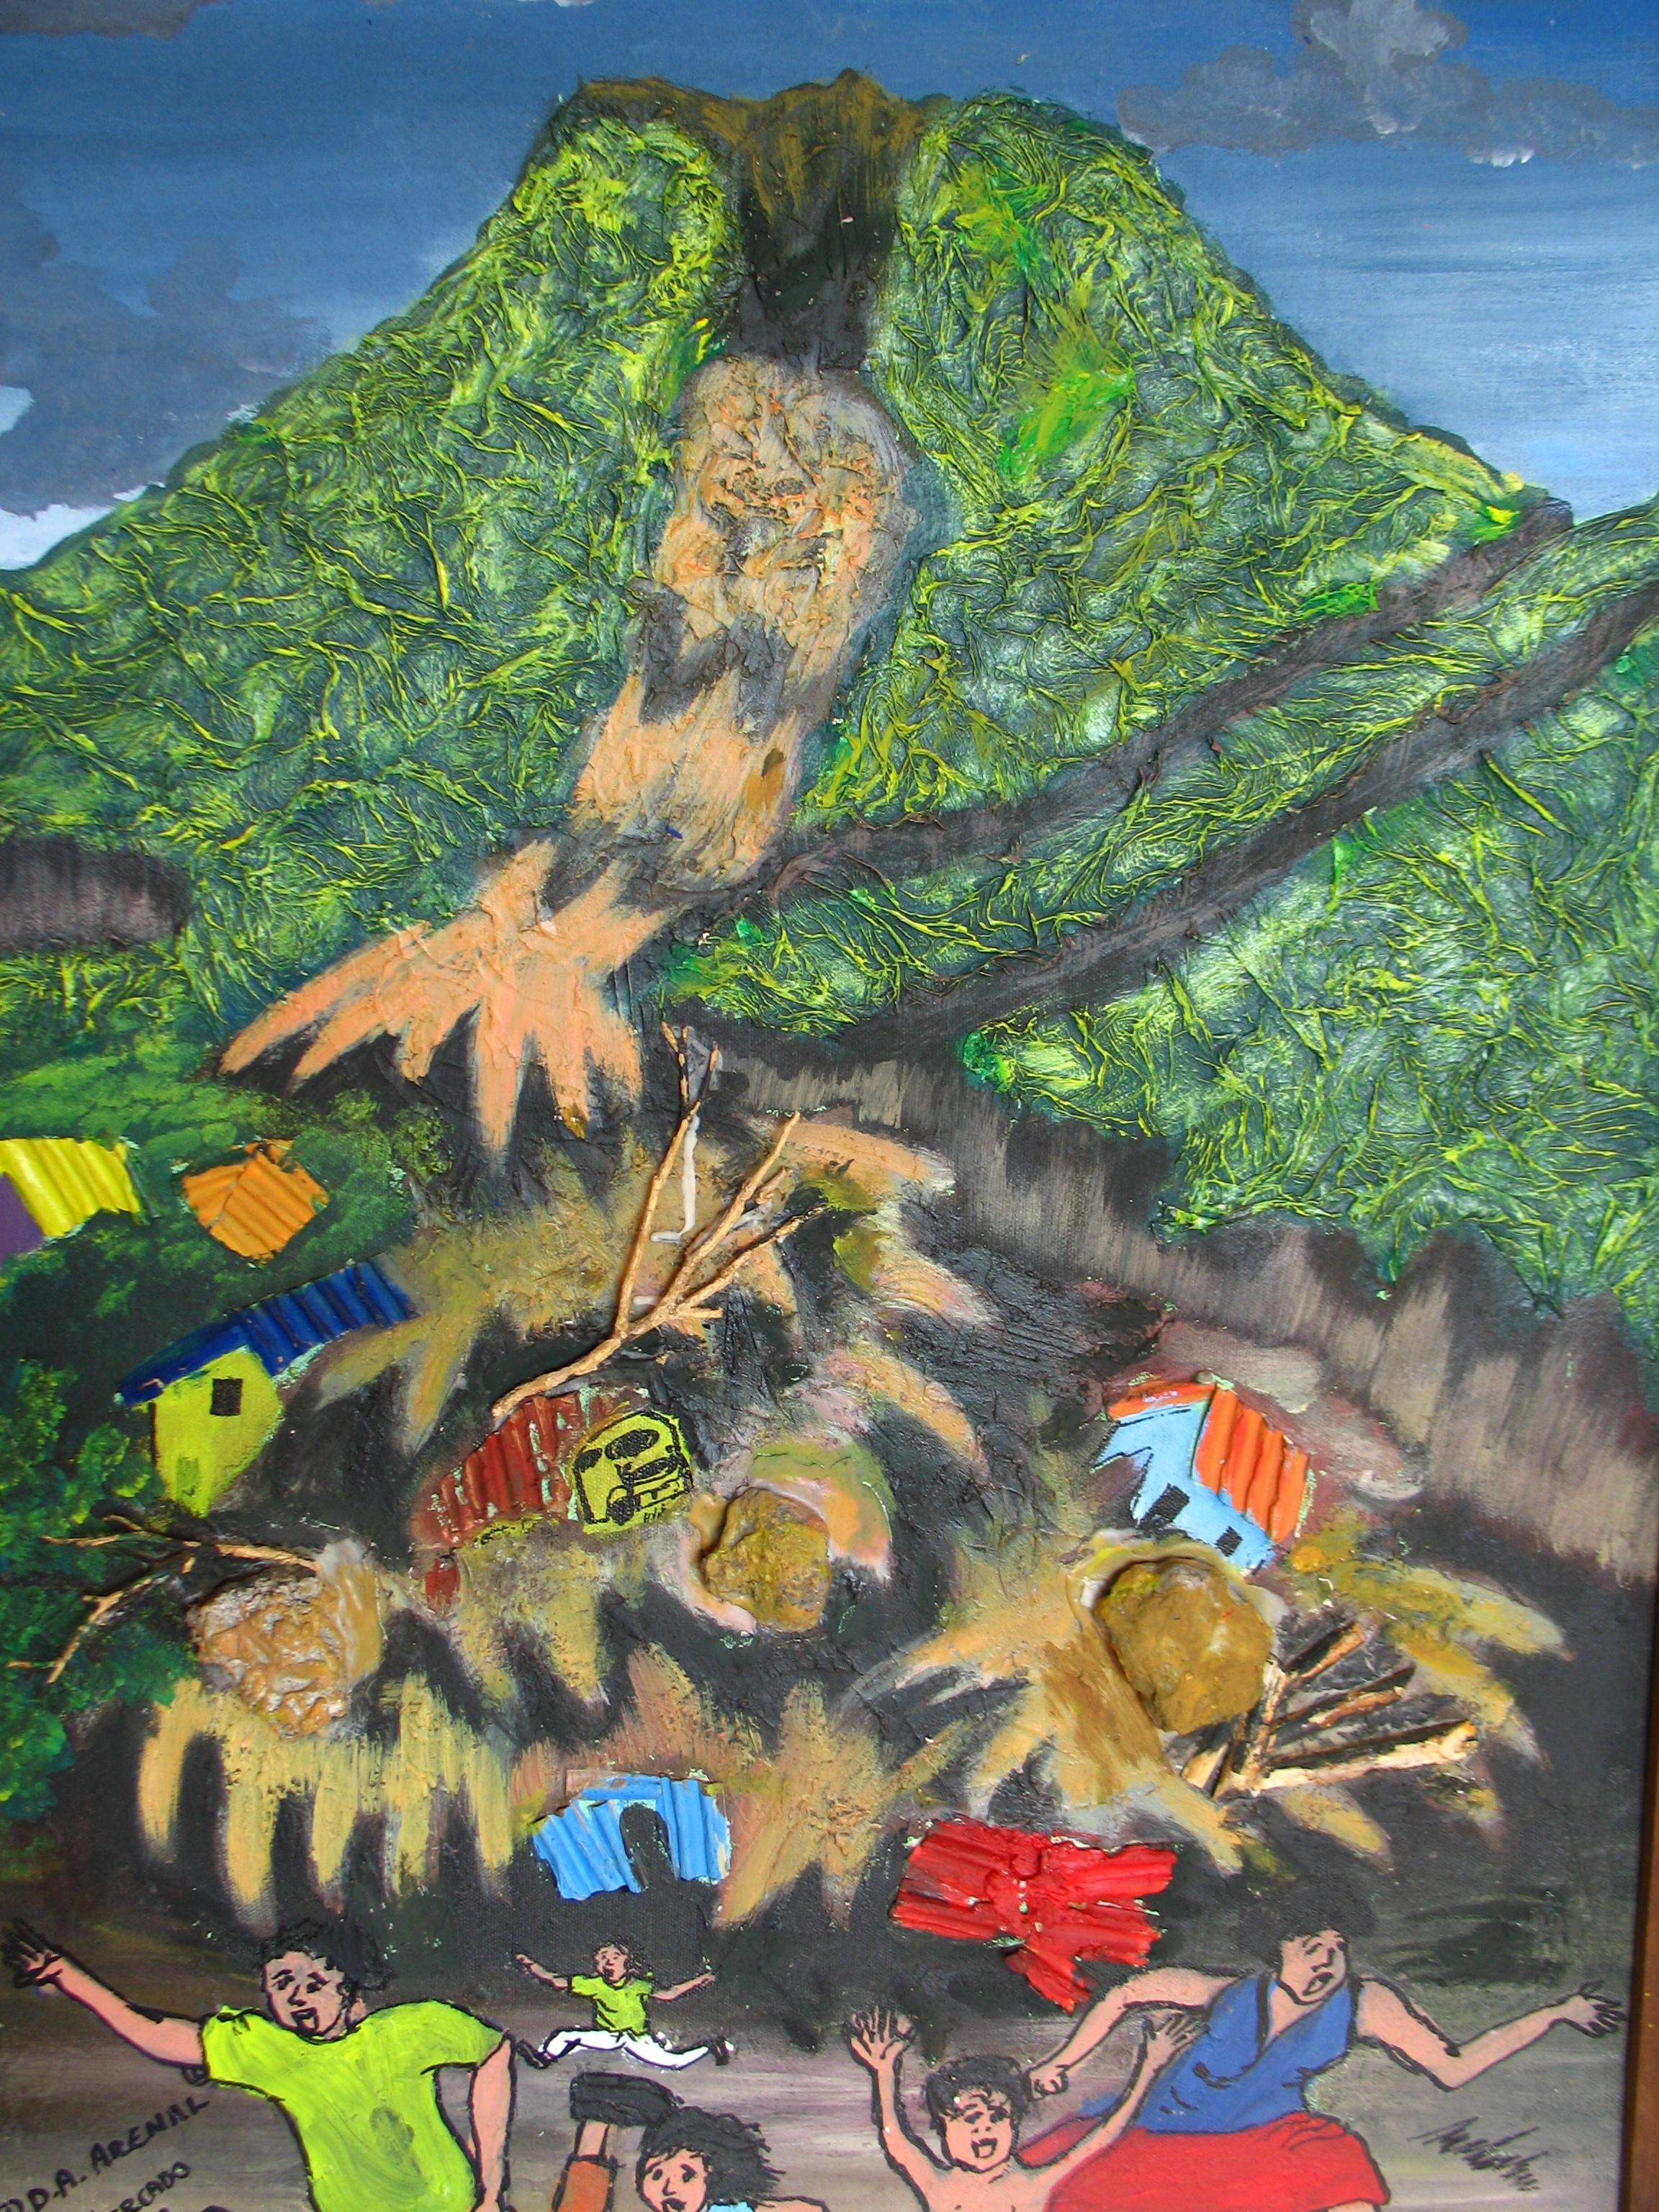 community artwork as part of an ngo drr program in latin america